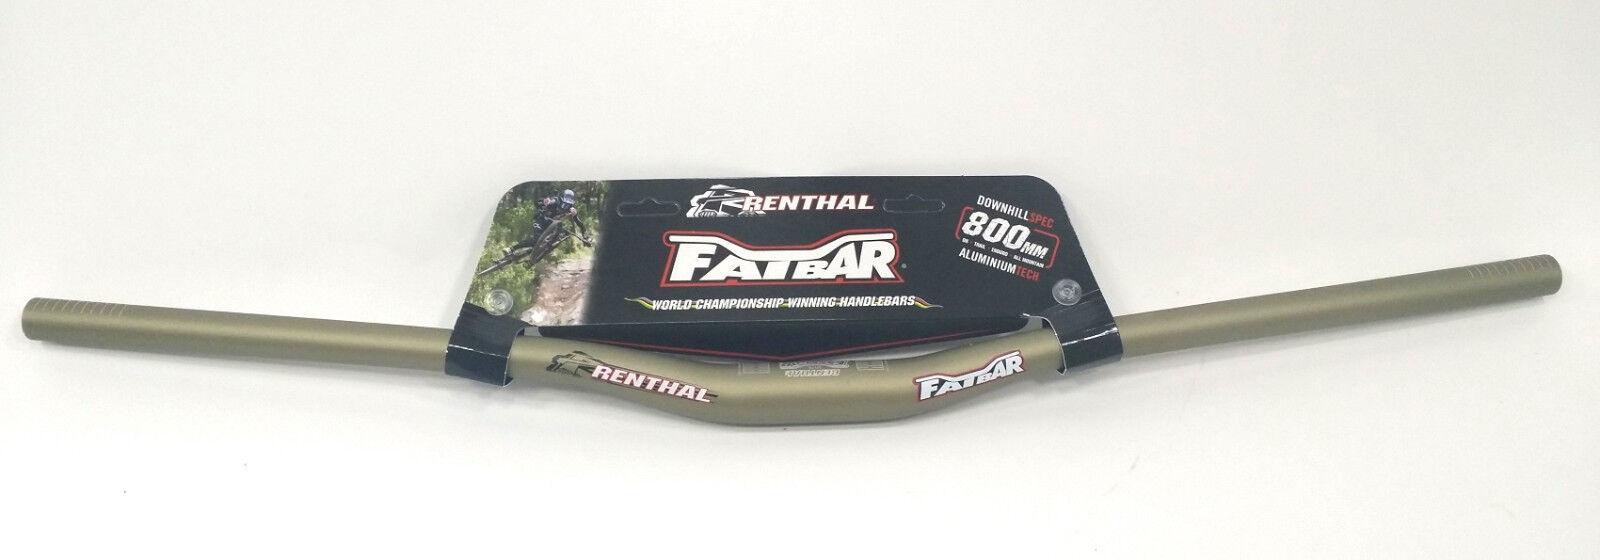 Renthal Fatbar V2  MTB Handlebar 31.8mm, 800mm Width, 20mm Rise, gold  team promotions